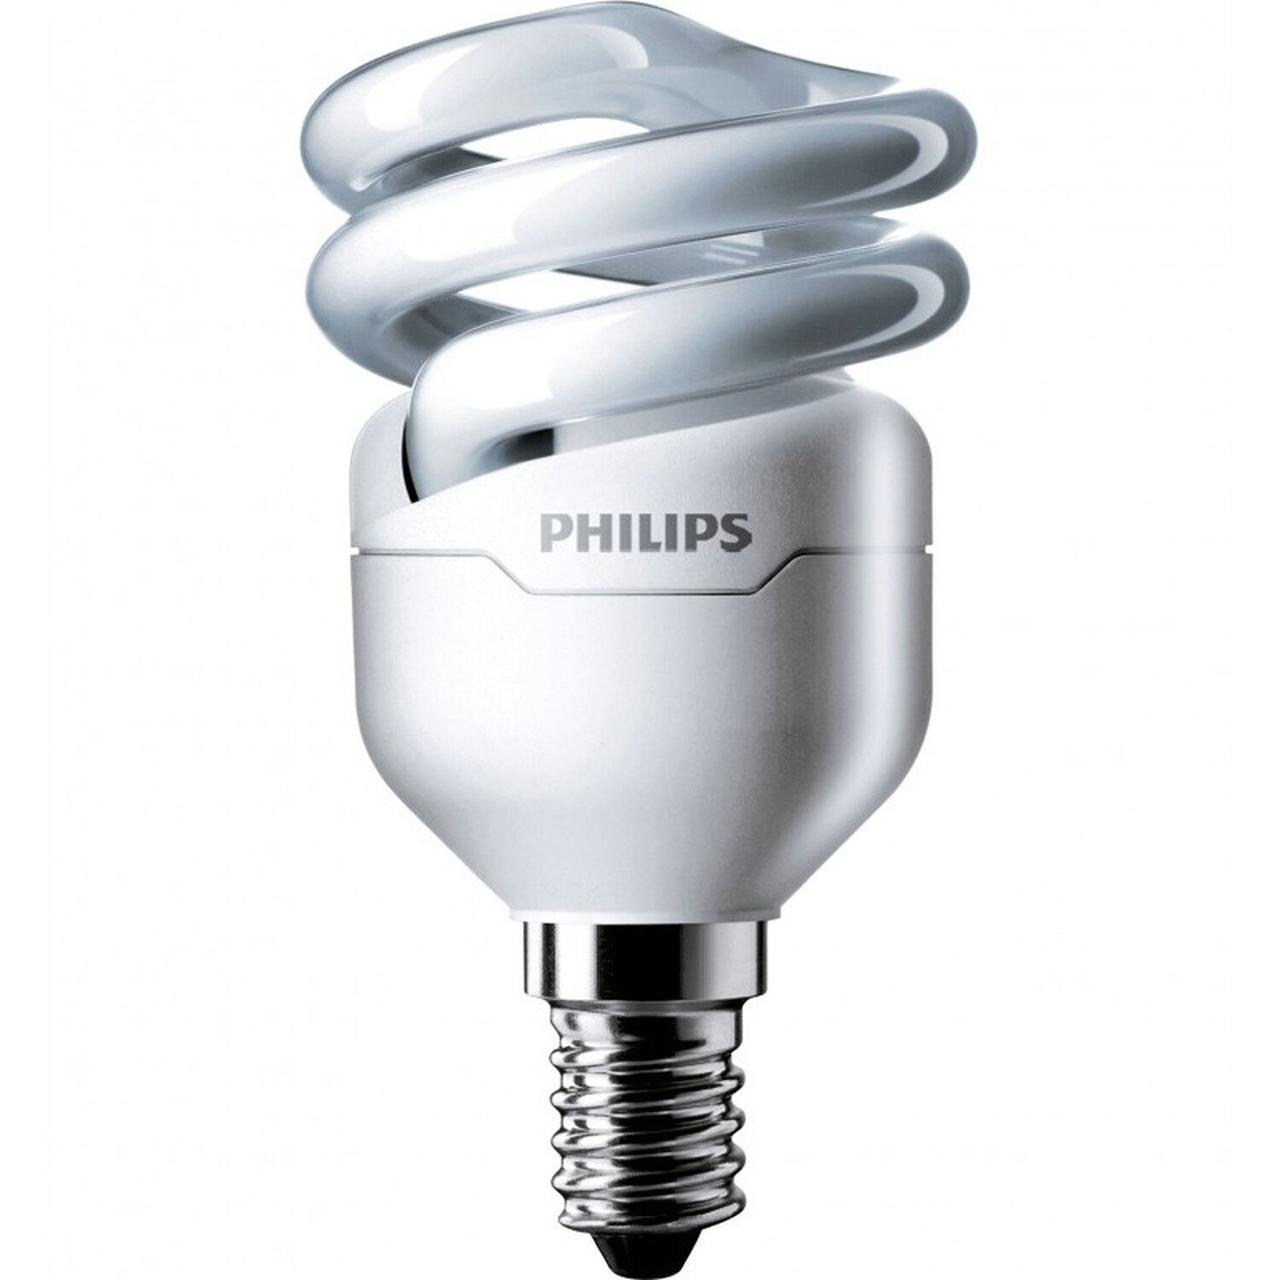 Лампа энергосберегающая Tornado spiral 8W 827 WW E14 Philips /871829111716200/